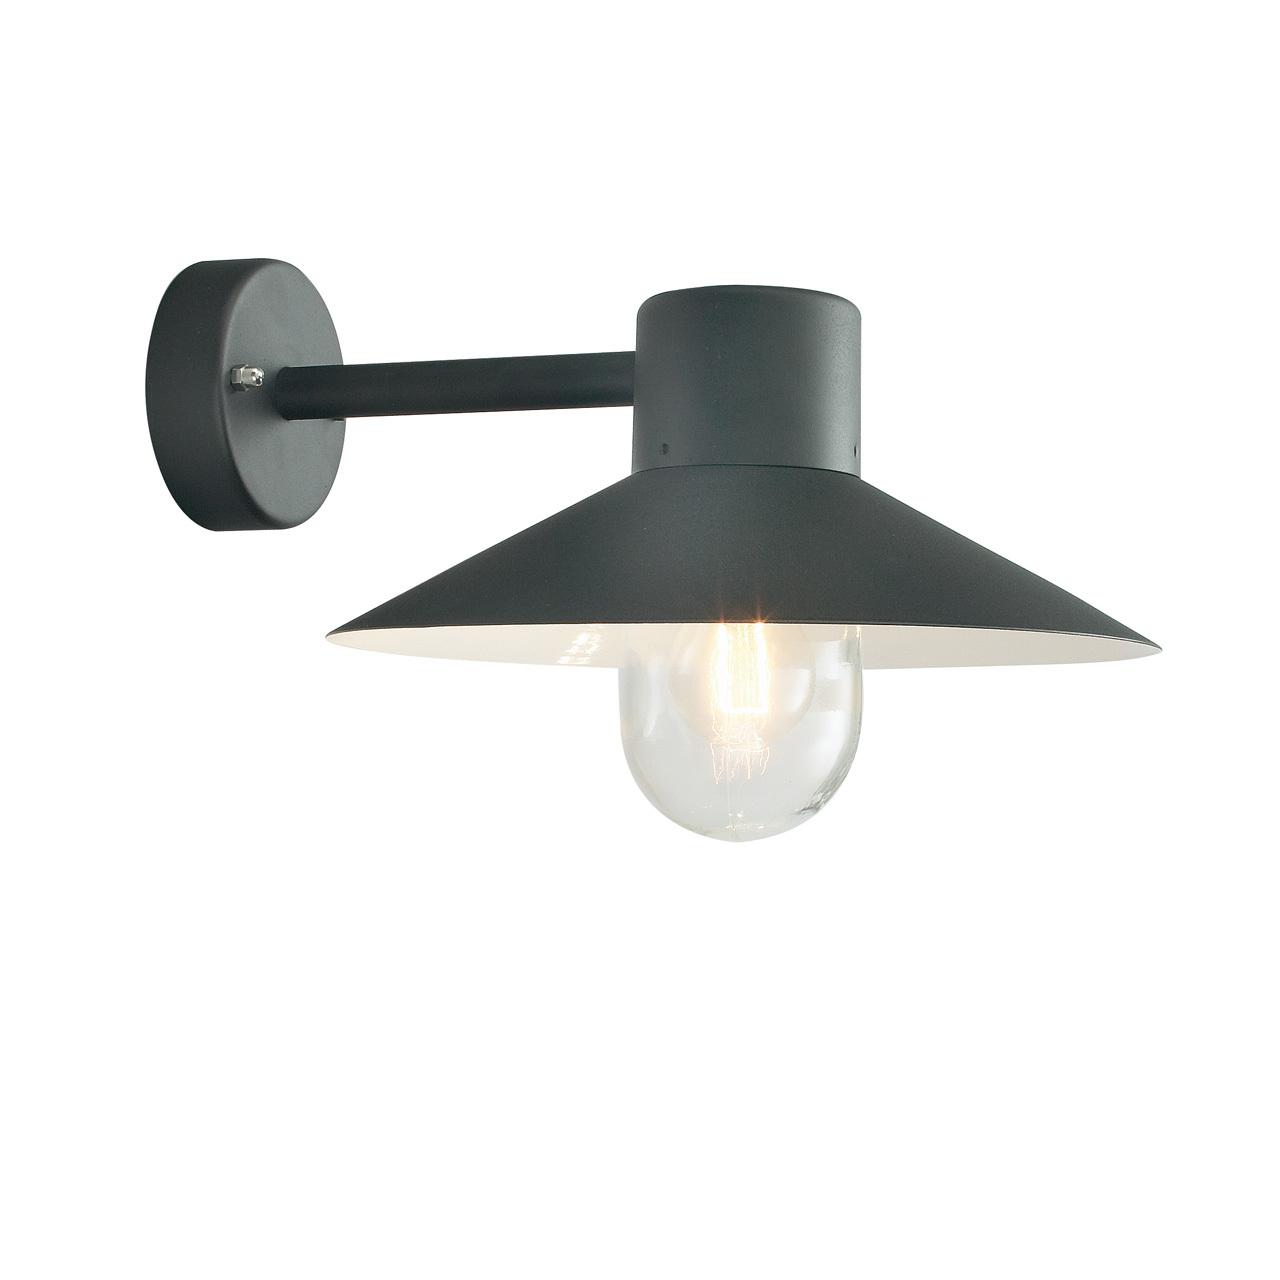 Lampa ścienna LUND 290B -Norlys